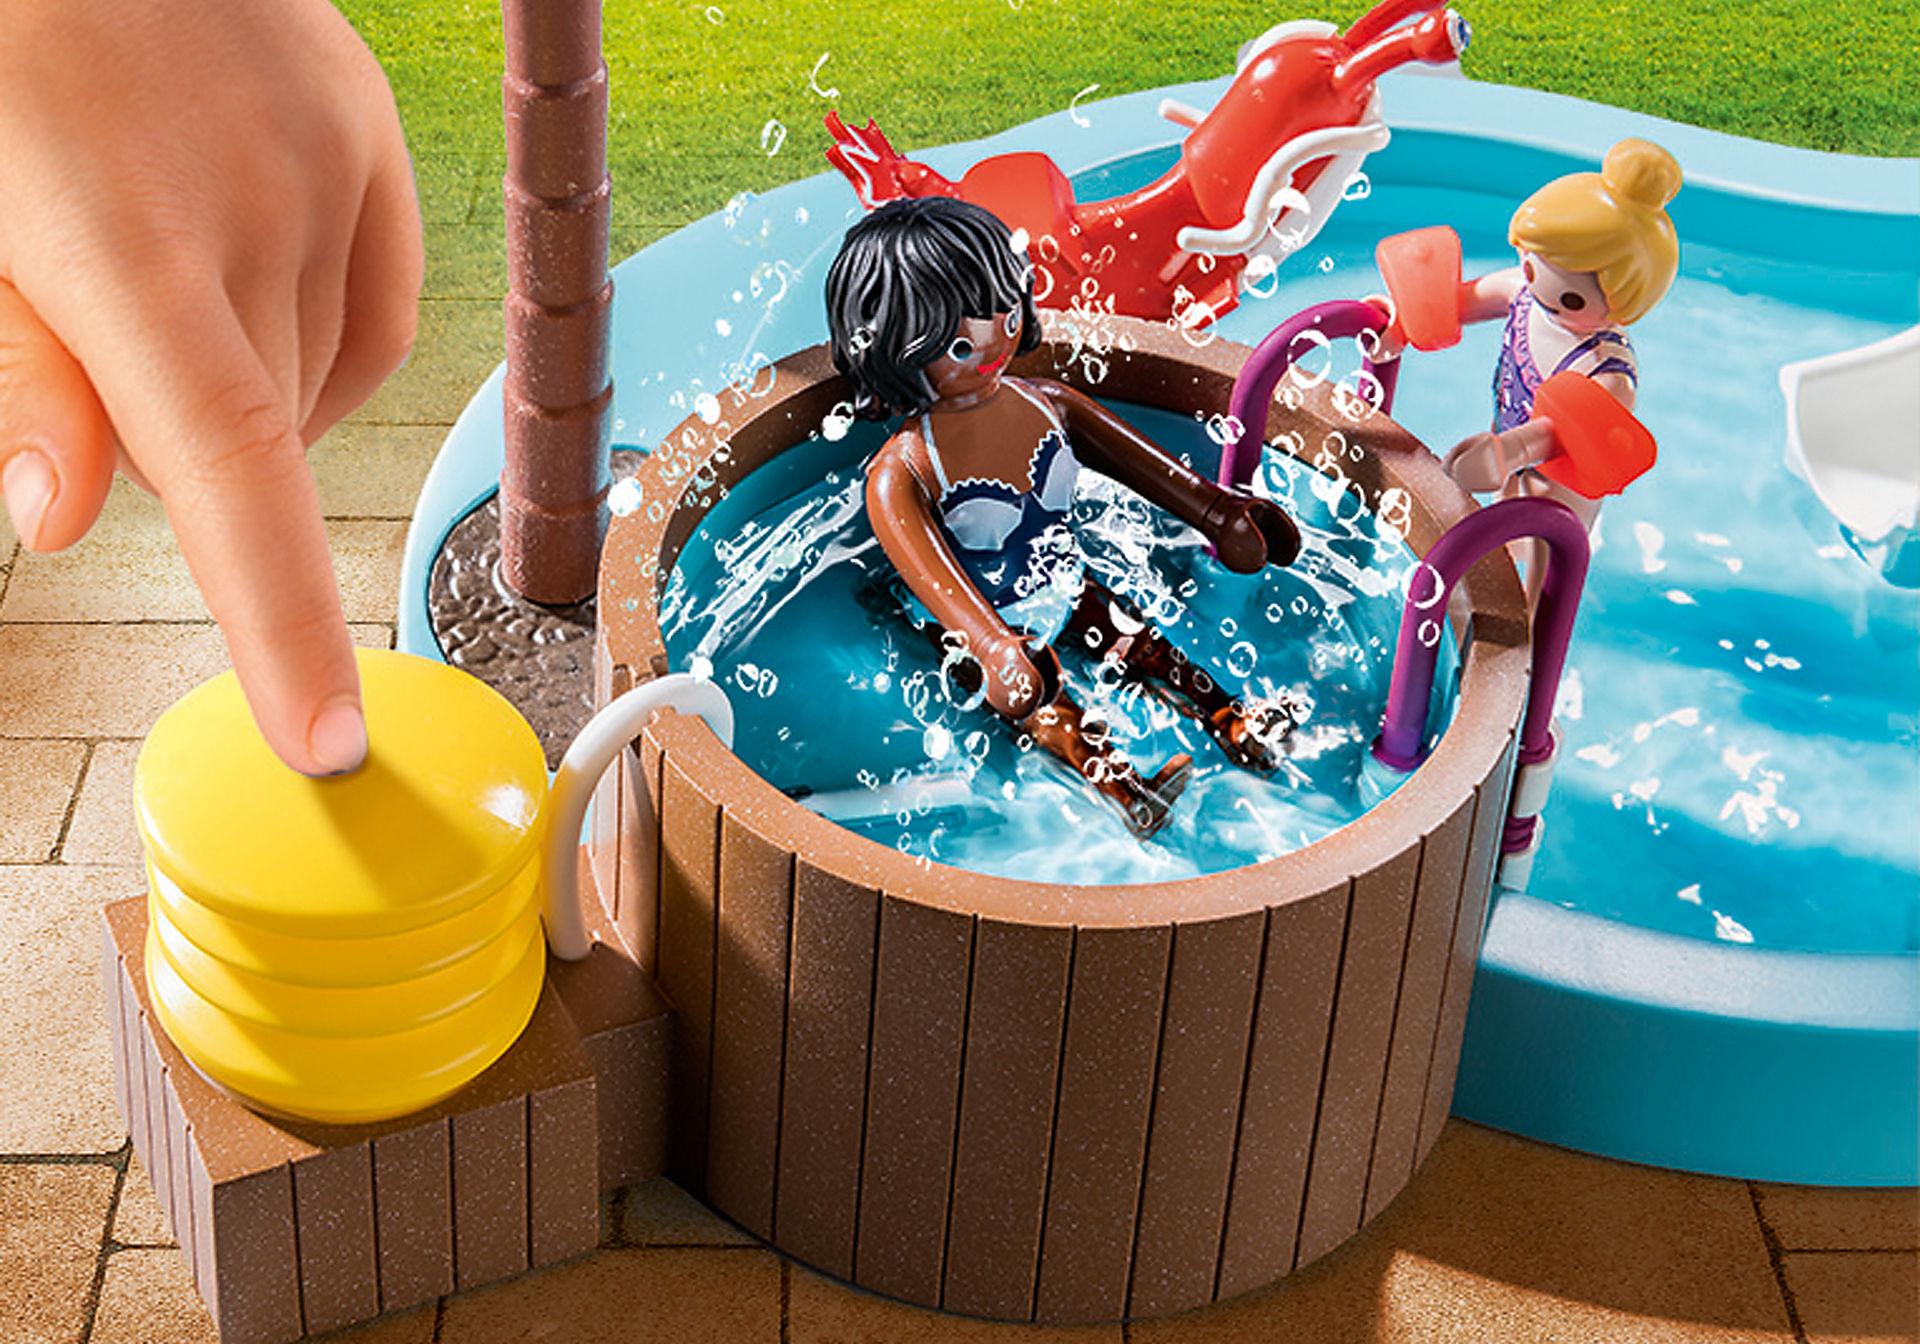 70611 Kinderbecken mit Whirlpool zoom image5